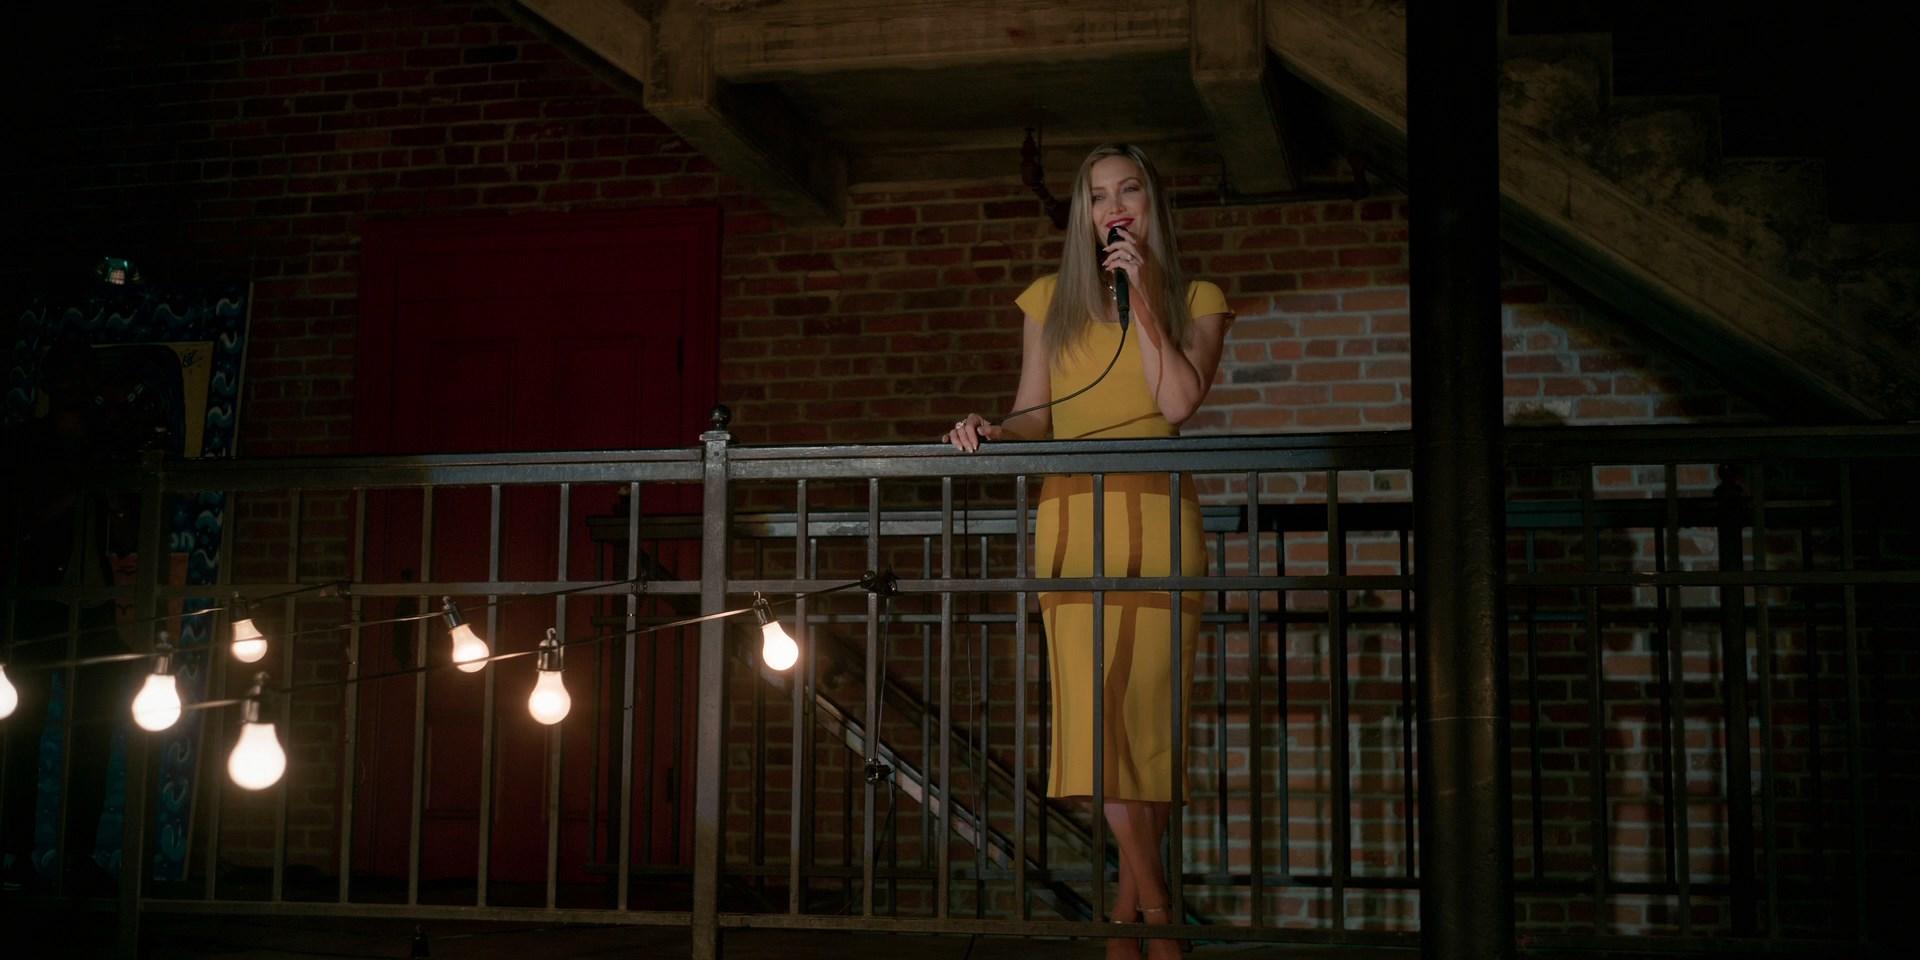 Truth Be Told Temporada 2 (2021) 1080p WEB-DL Latino